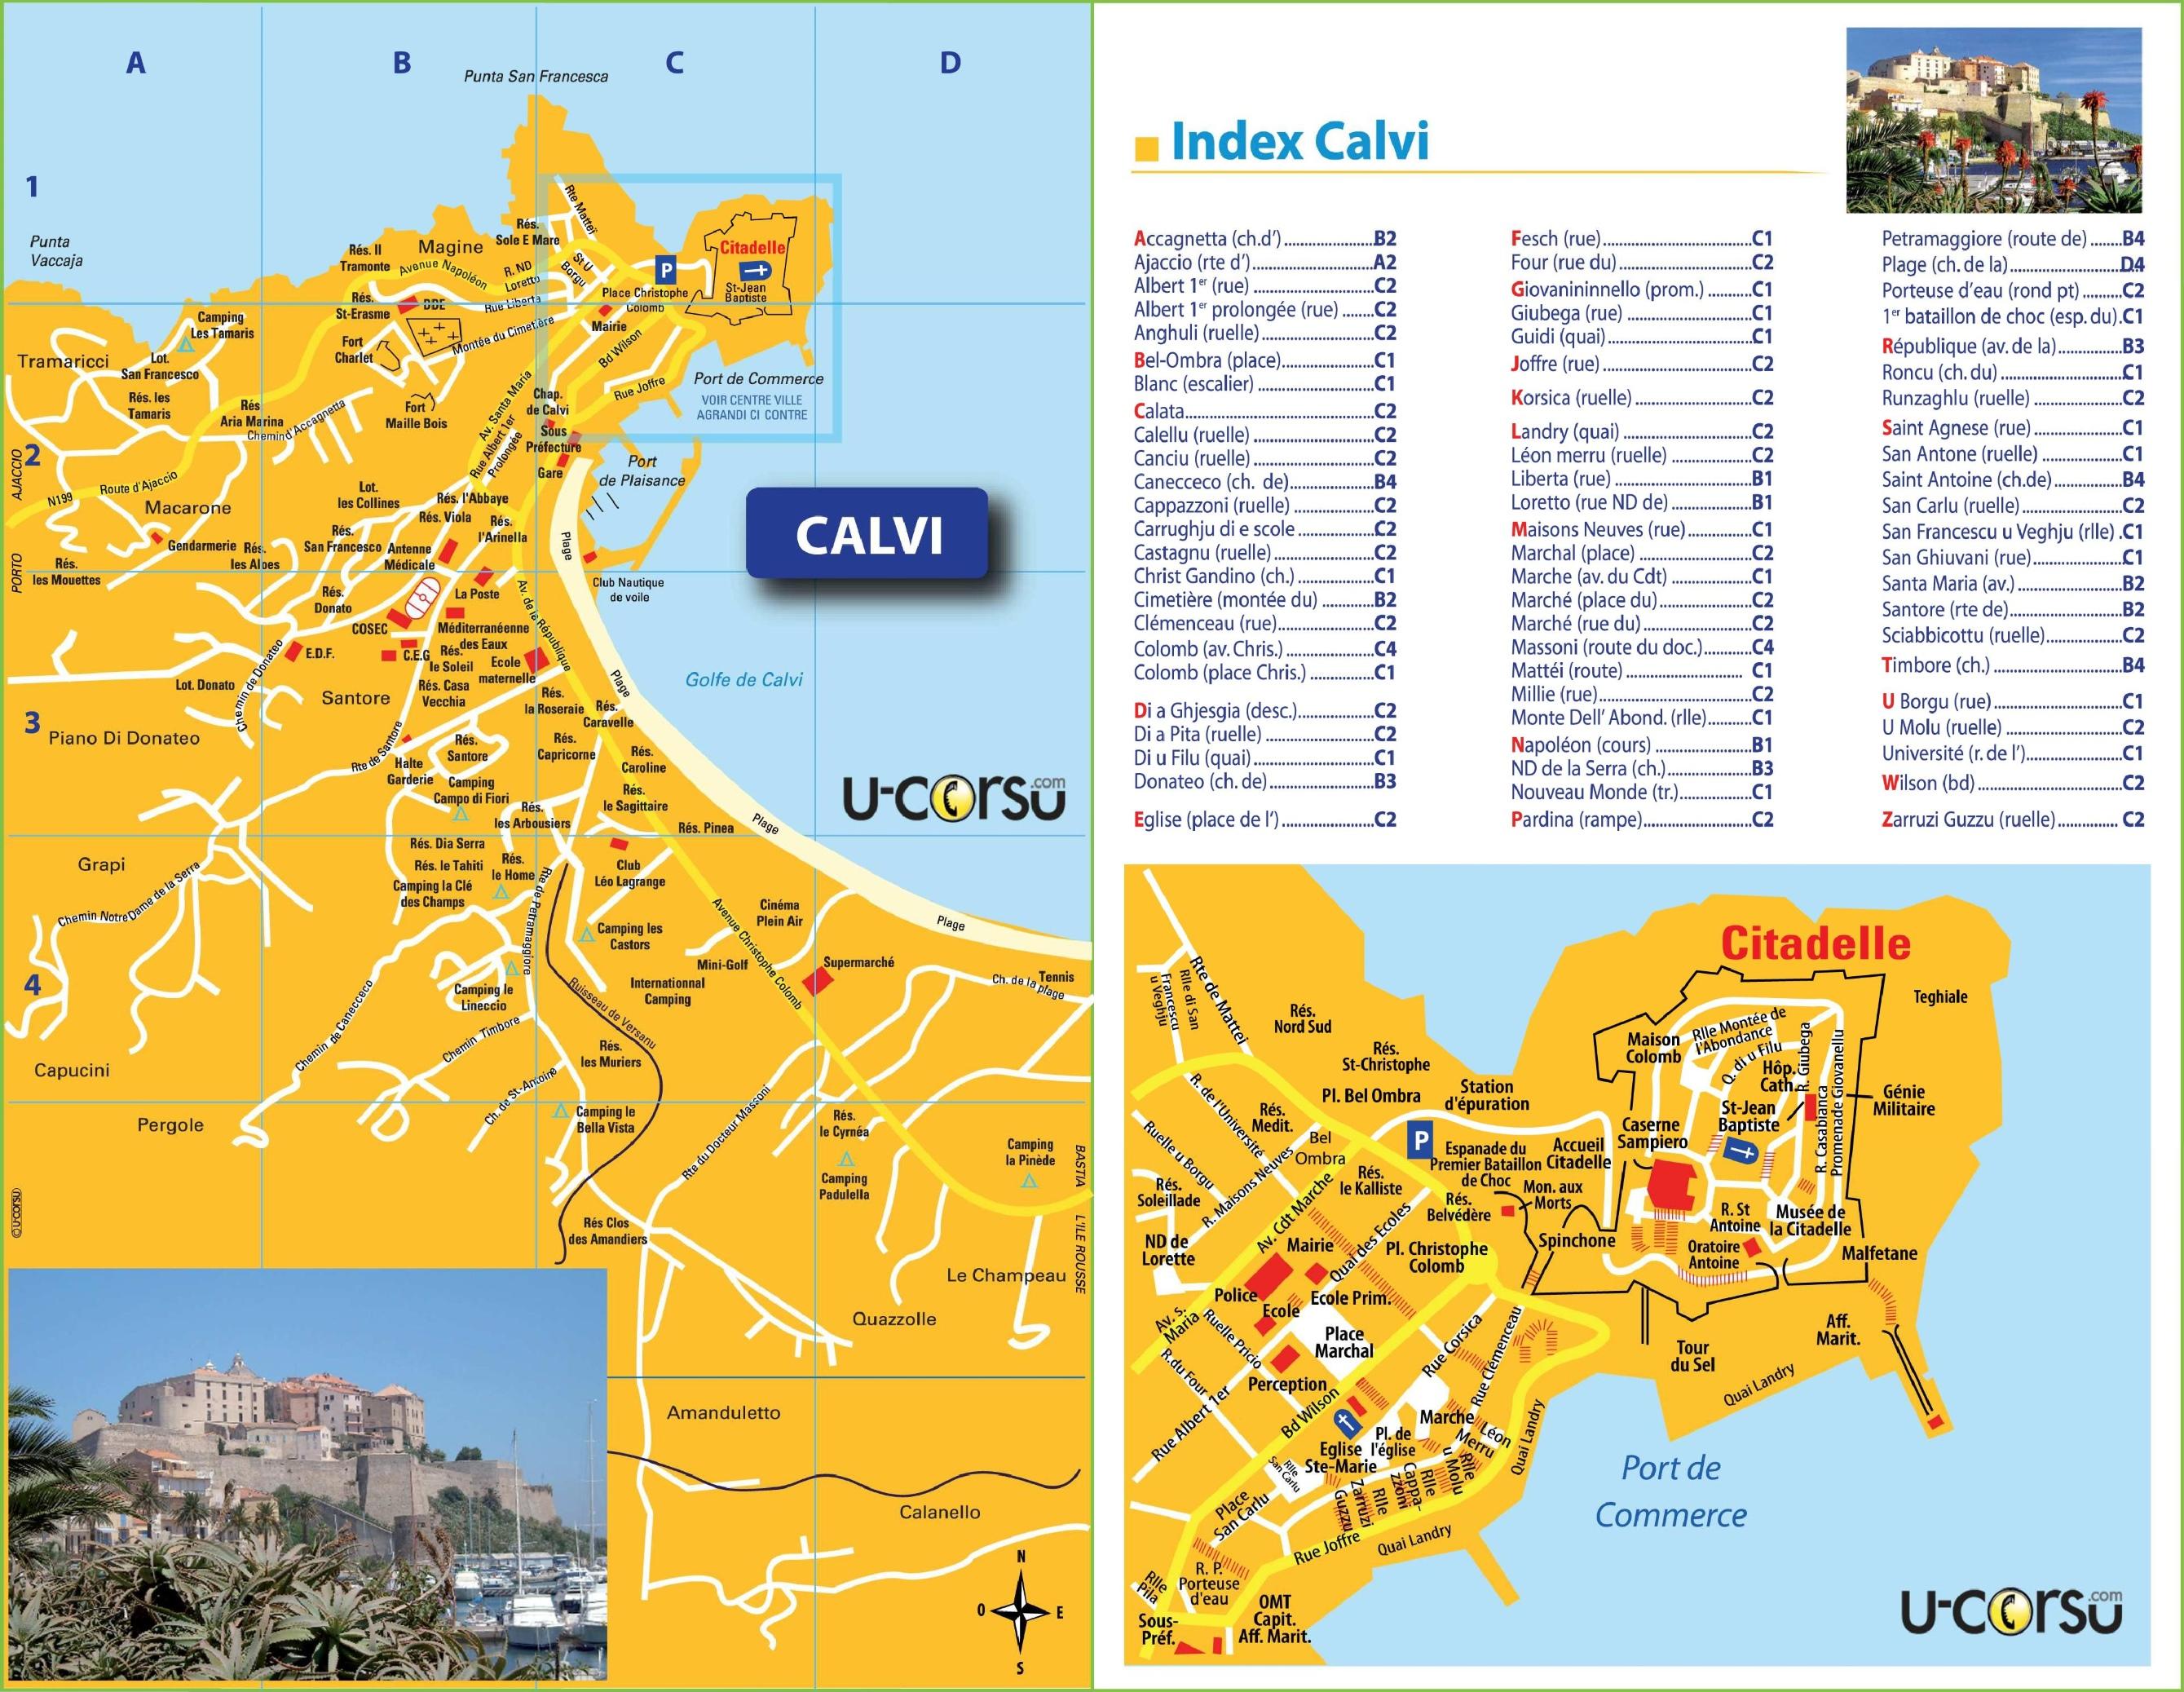 Calvi tourist map